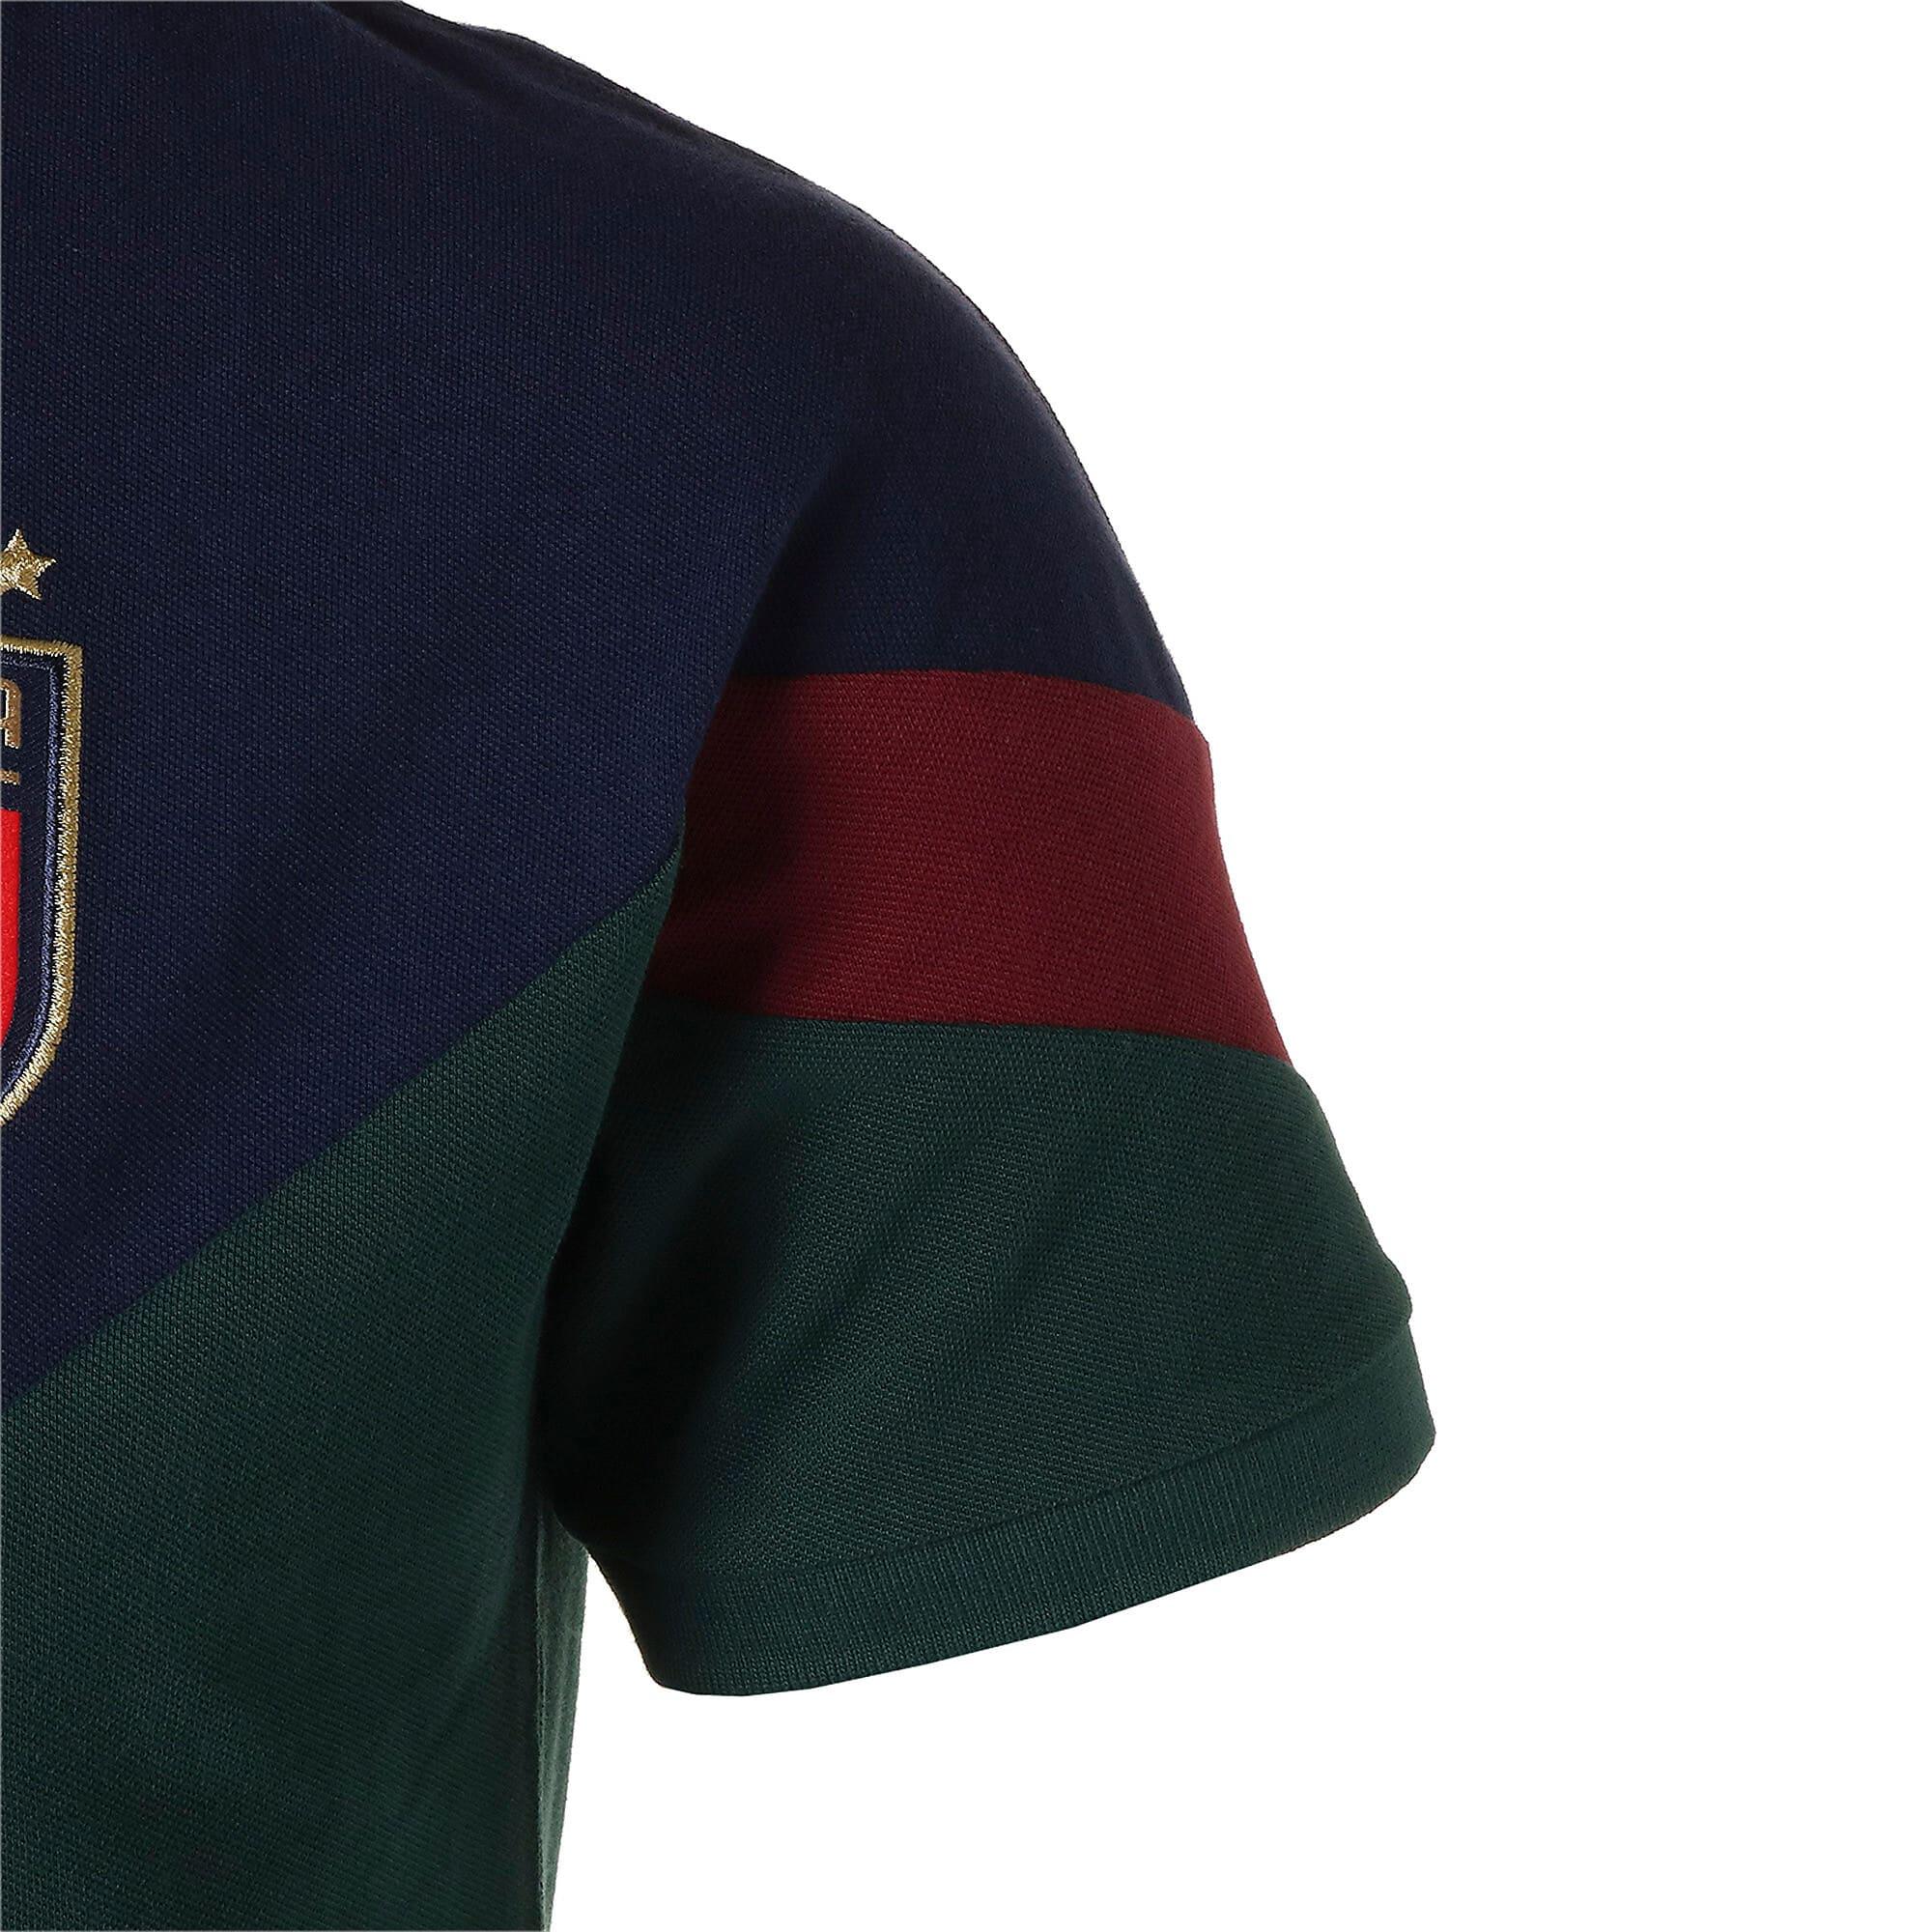 Thumbnail 5 of FIGC イタリア ICONIC MCS ポロシャツ 半袖, Ponderosa Pine-peacoat, medium-JPN